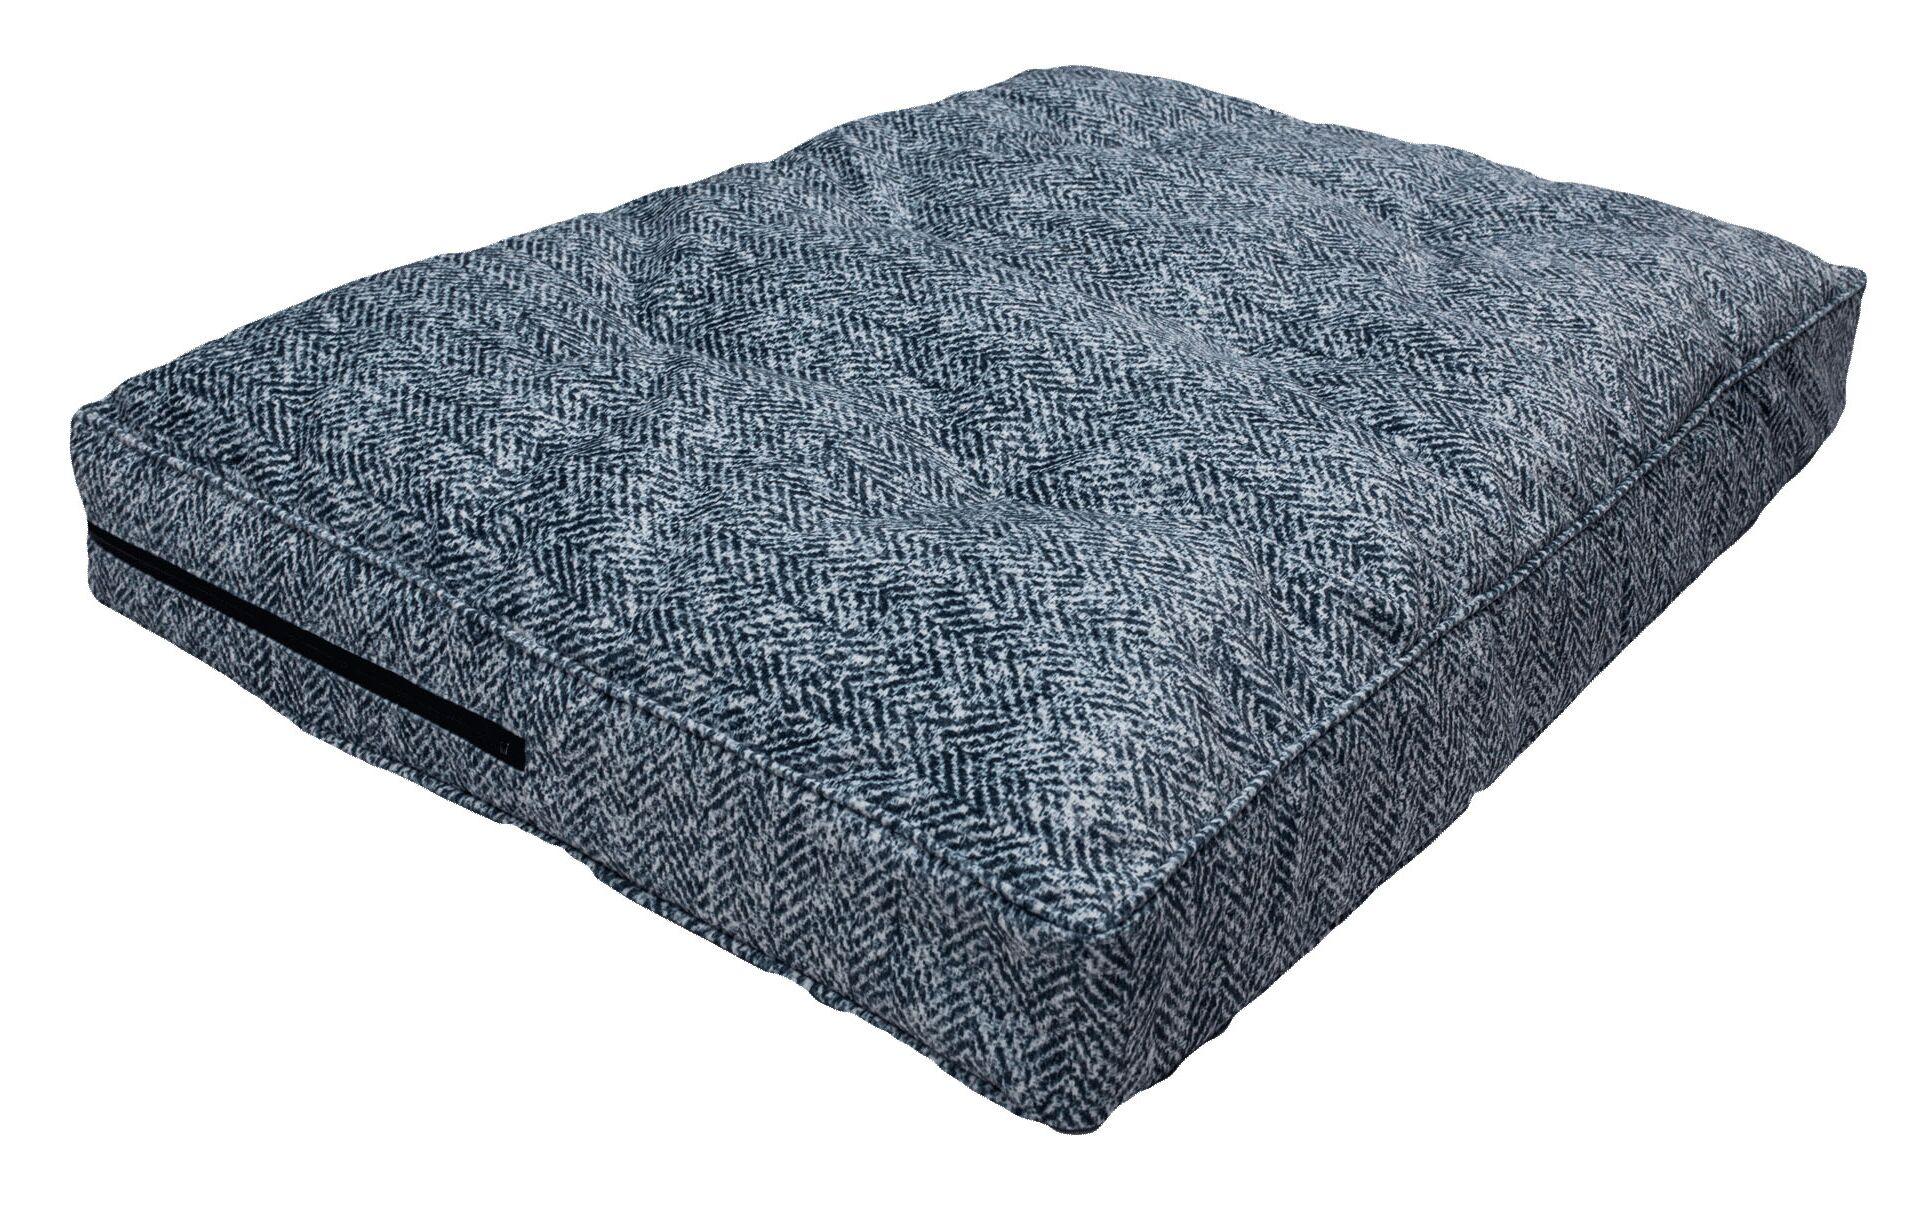 Show Dog Premium Orthopedic Pillow Size: Small (30